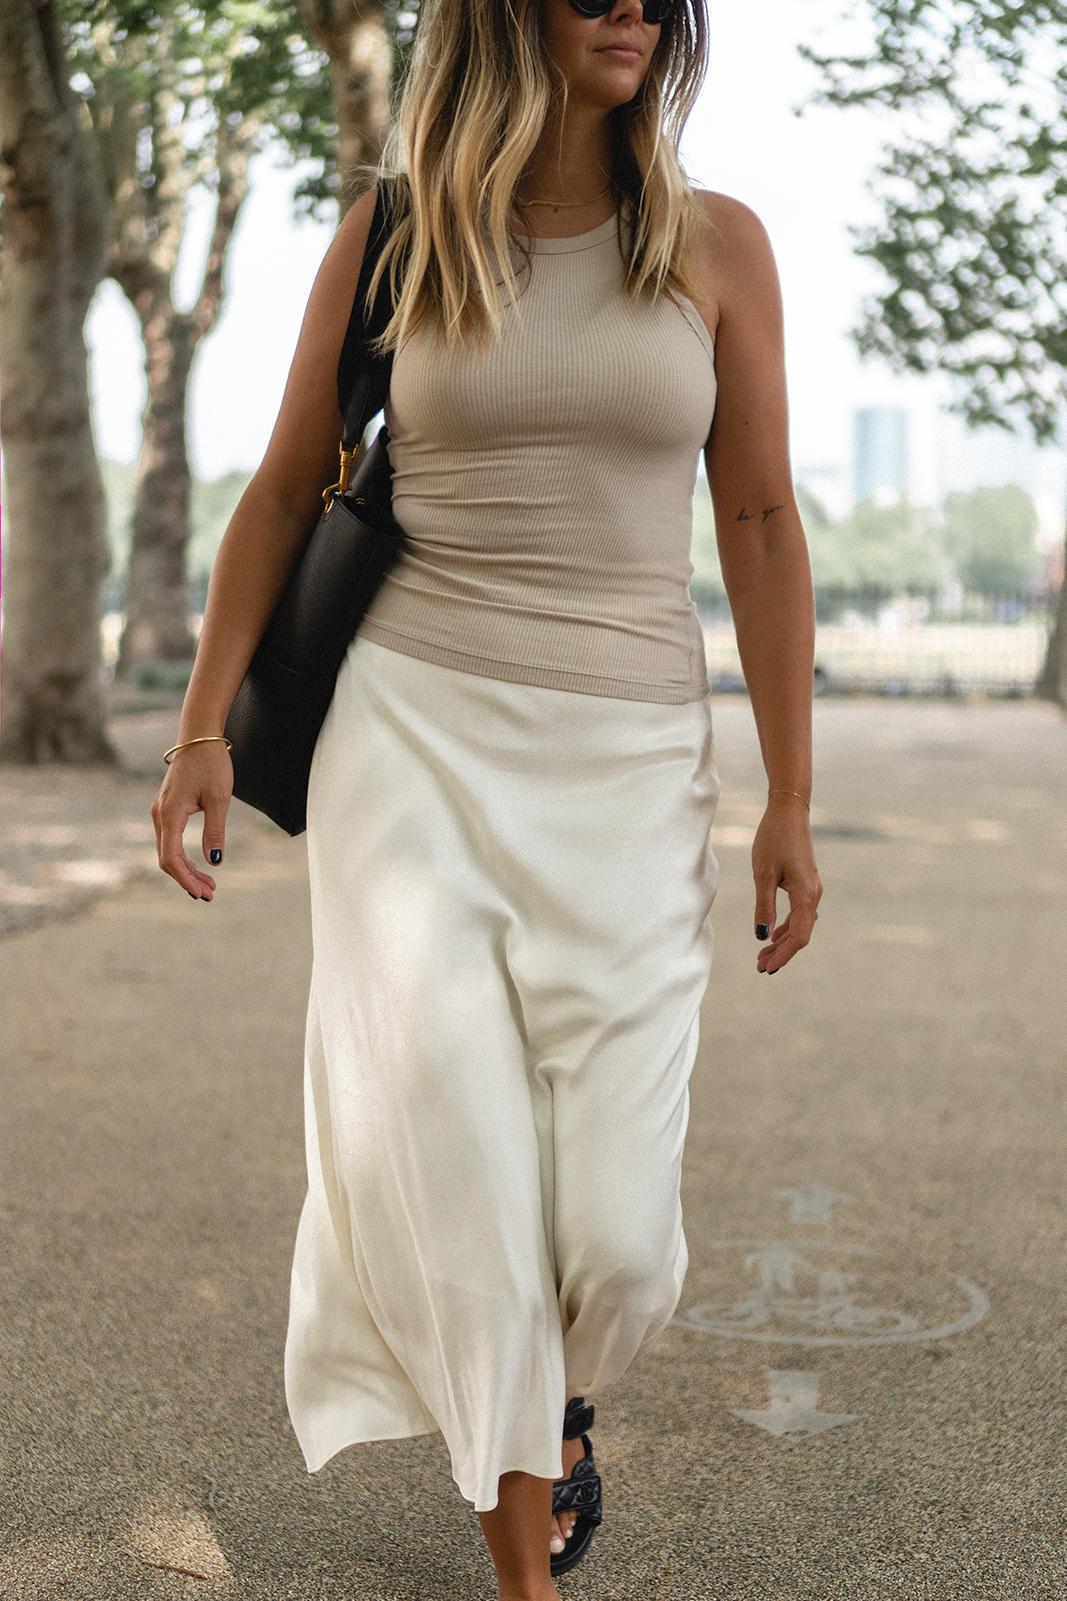 Emma Hill wears white satin slip midi skirt, beige ribbed vest tank top, blac medium Celine Seau Sangle bucket bag, gold jewellery, black nails, chic Summer outfit